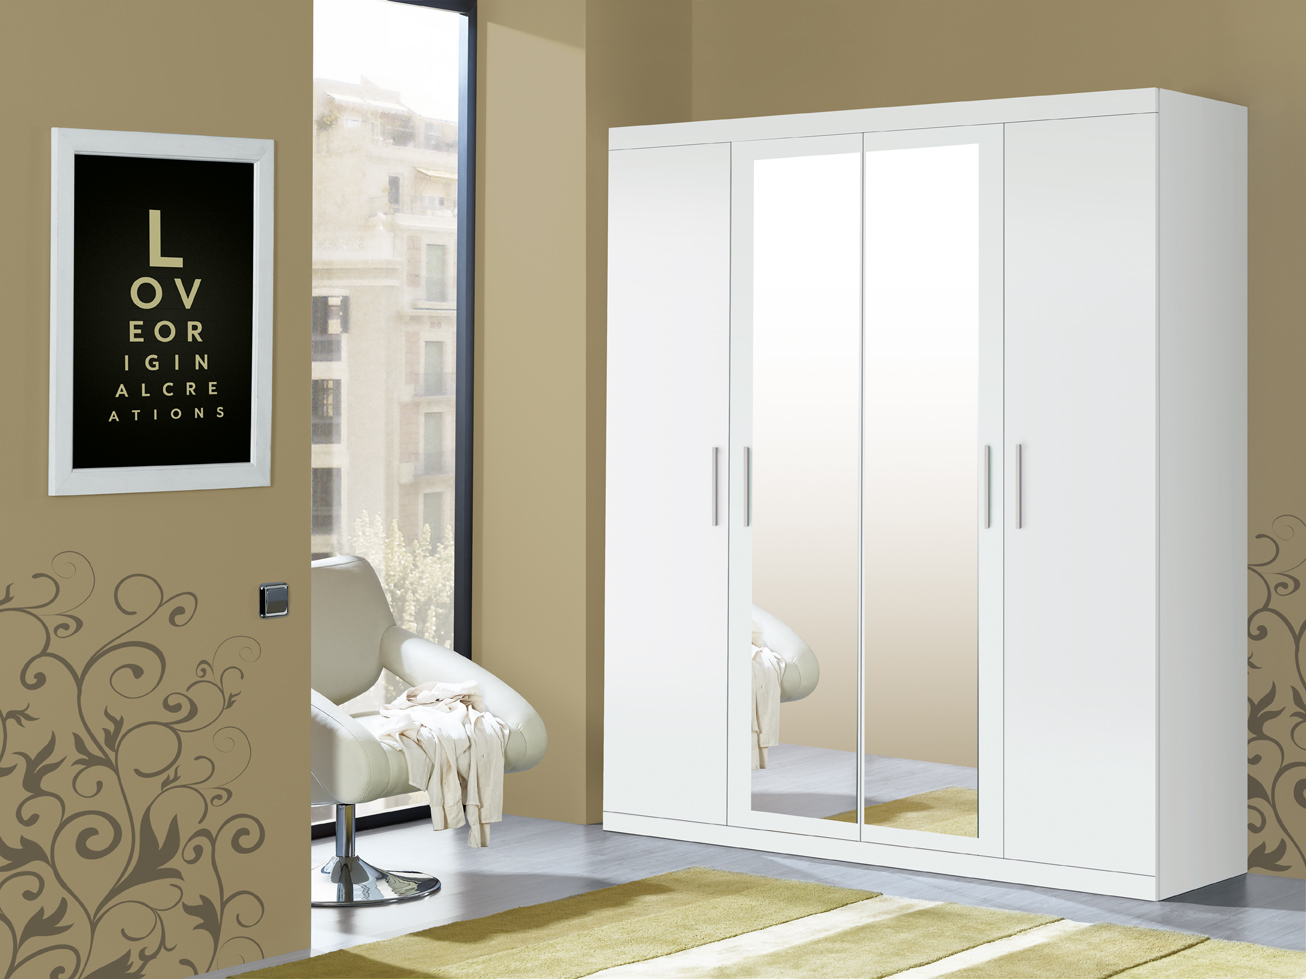 Muebles paco caballero ofertas del mueble for Armarios dormitorio matrimonio